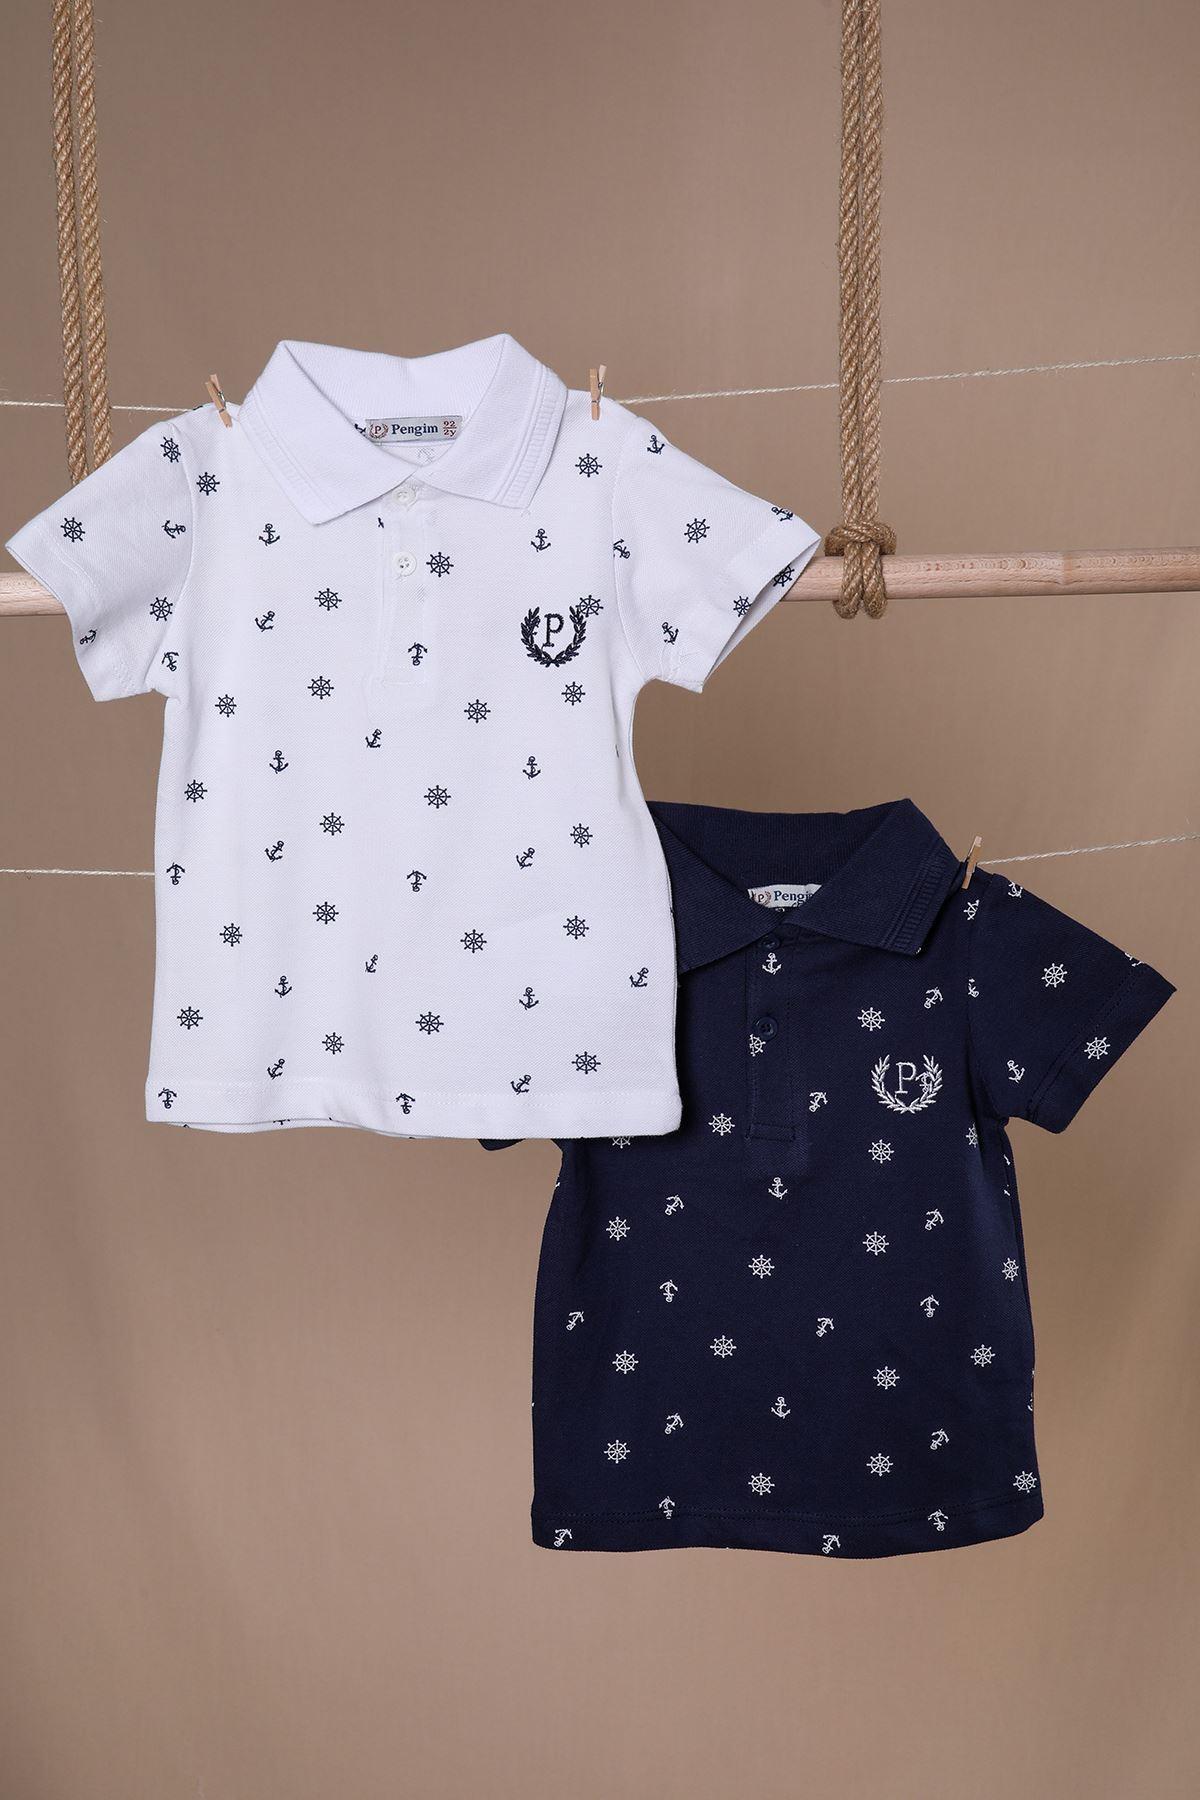 Çapalı Polo Yaka Erkek Çocuk T-shirt